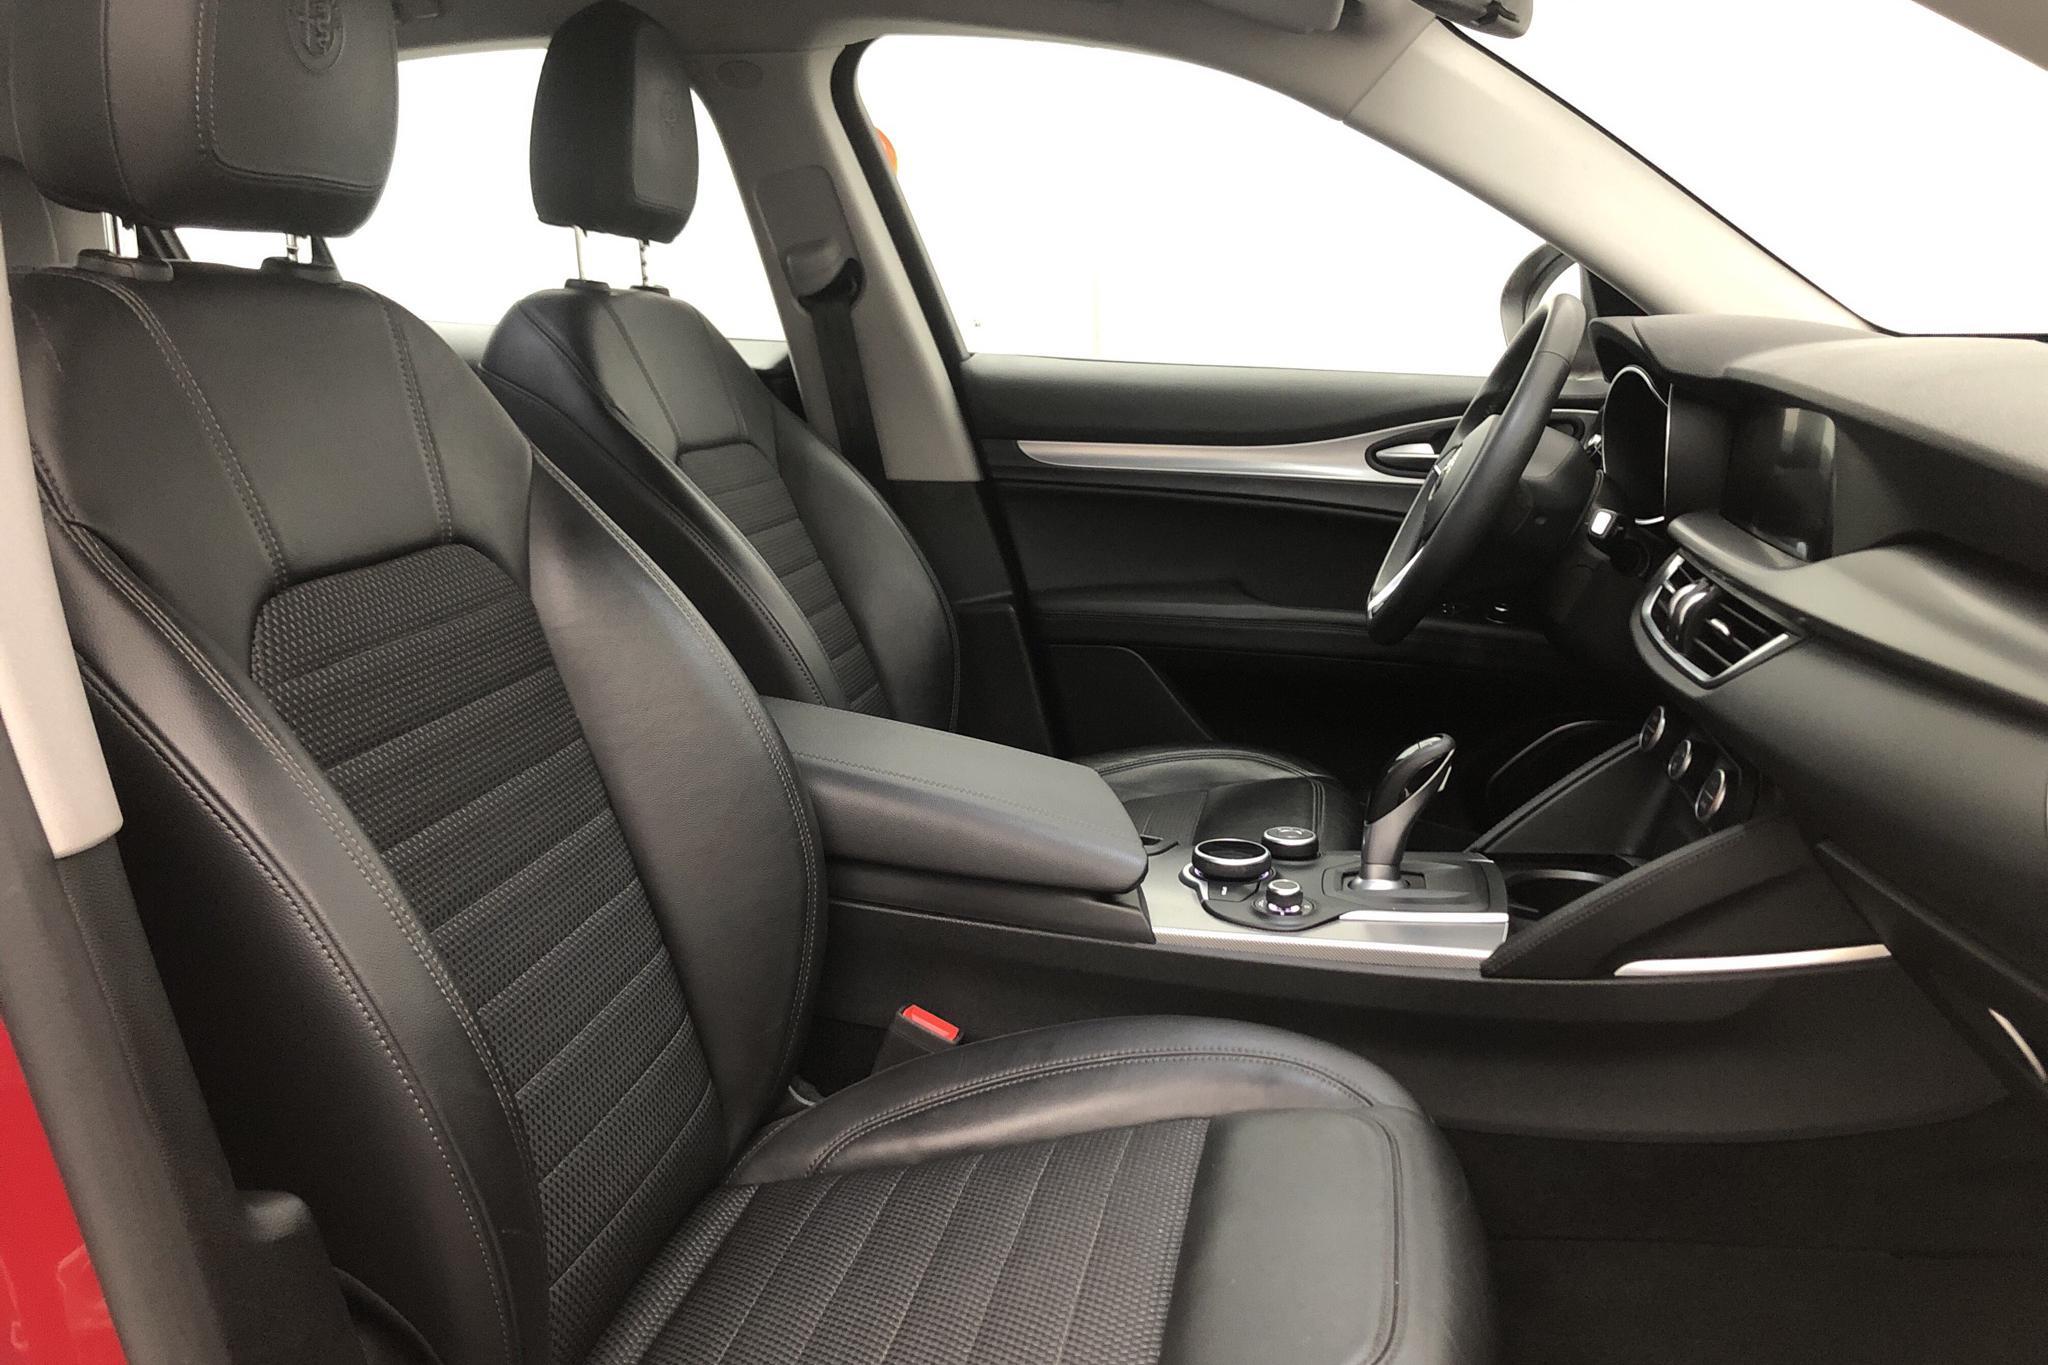 Alfa Romeo Stelvio 2.2 D AWD (210hk) - 8 224 mil - Automat - röd - 2017